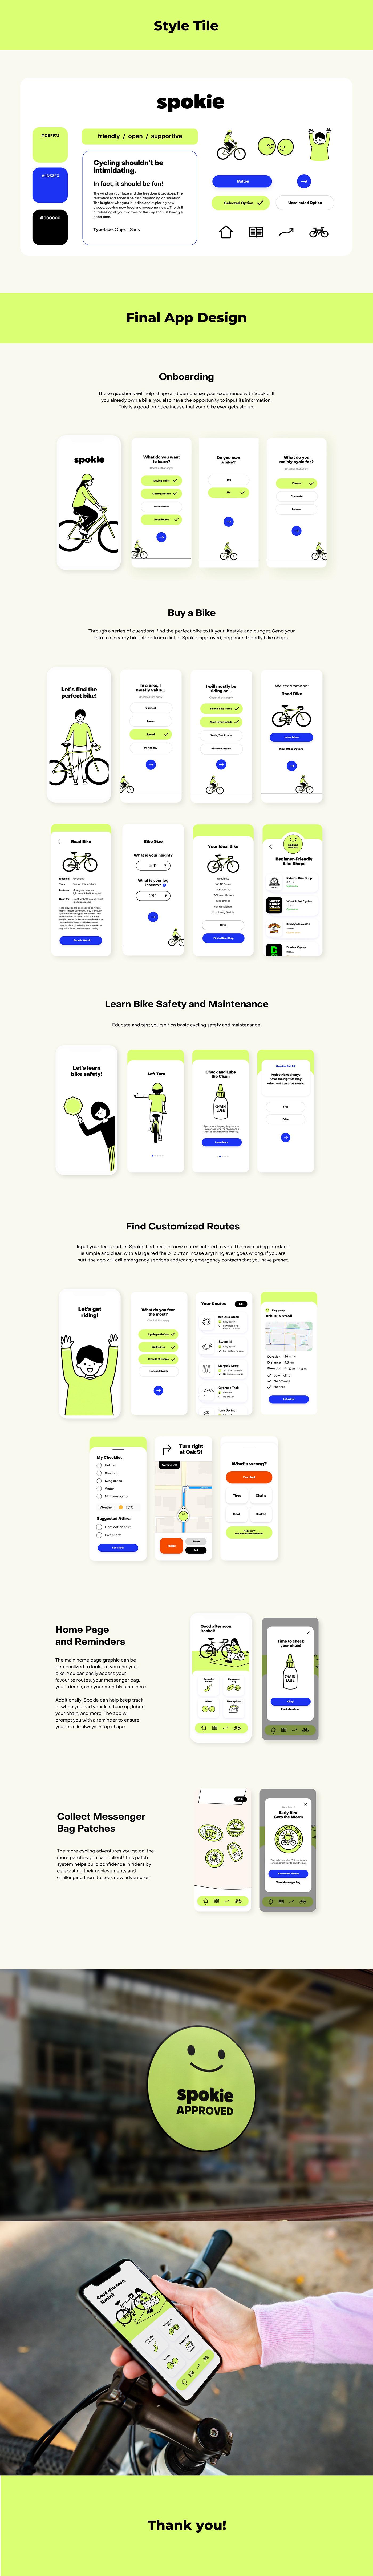 app design Bike cute Cycling Fun ILLUSTRATION  Mobile app sport Case Study